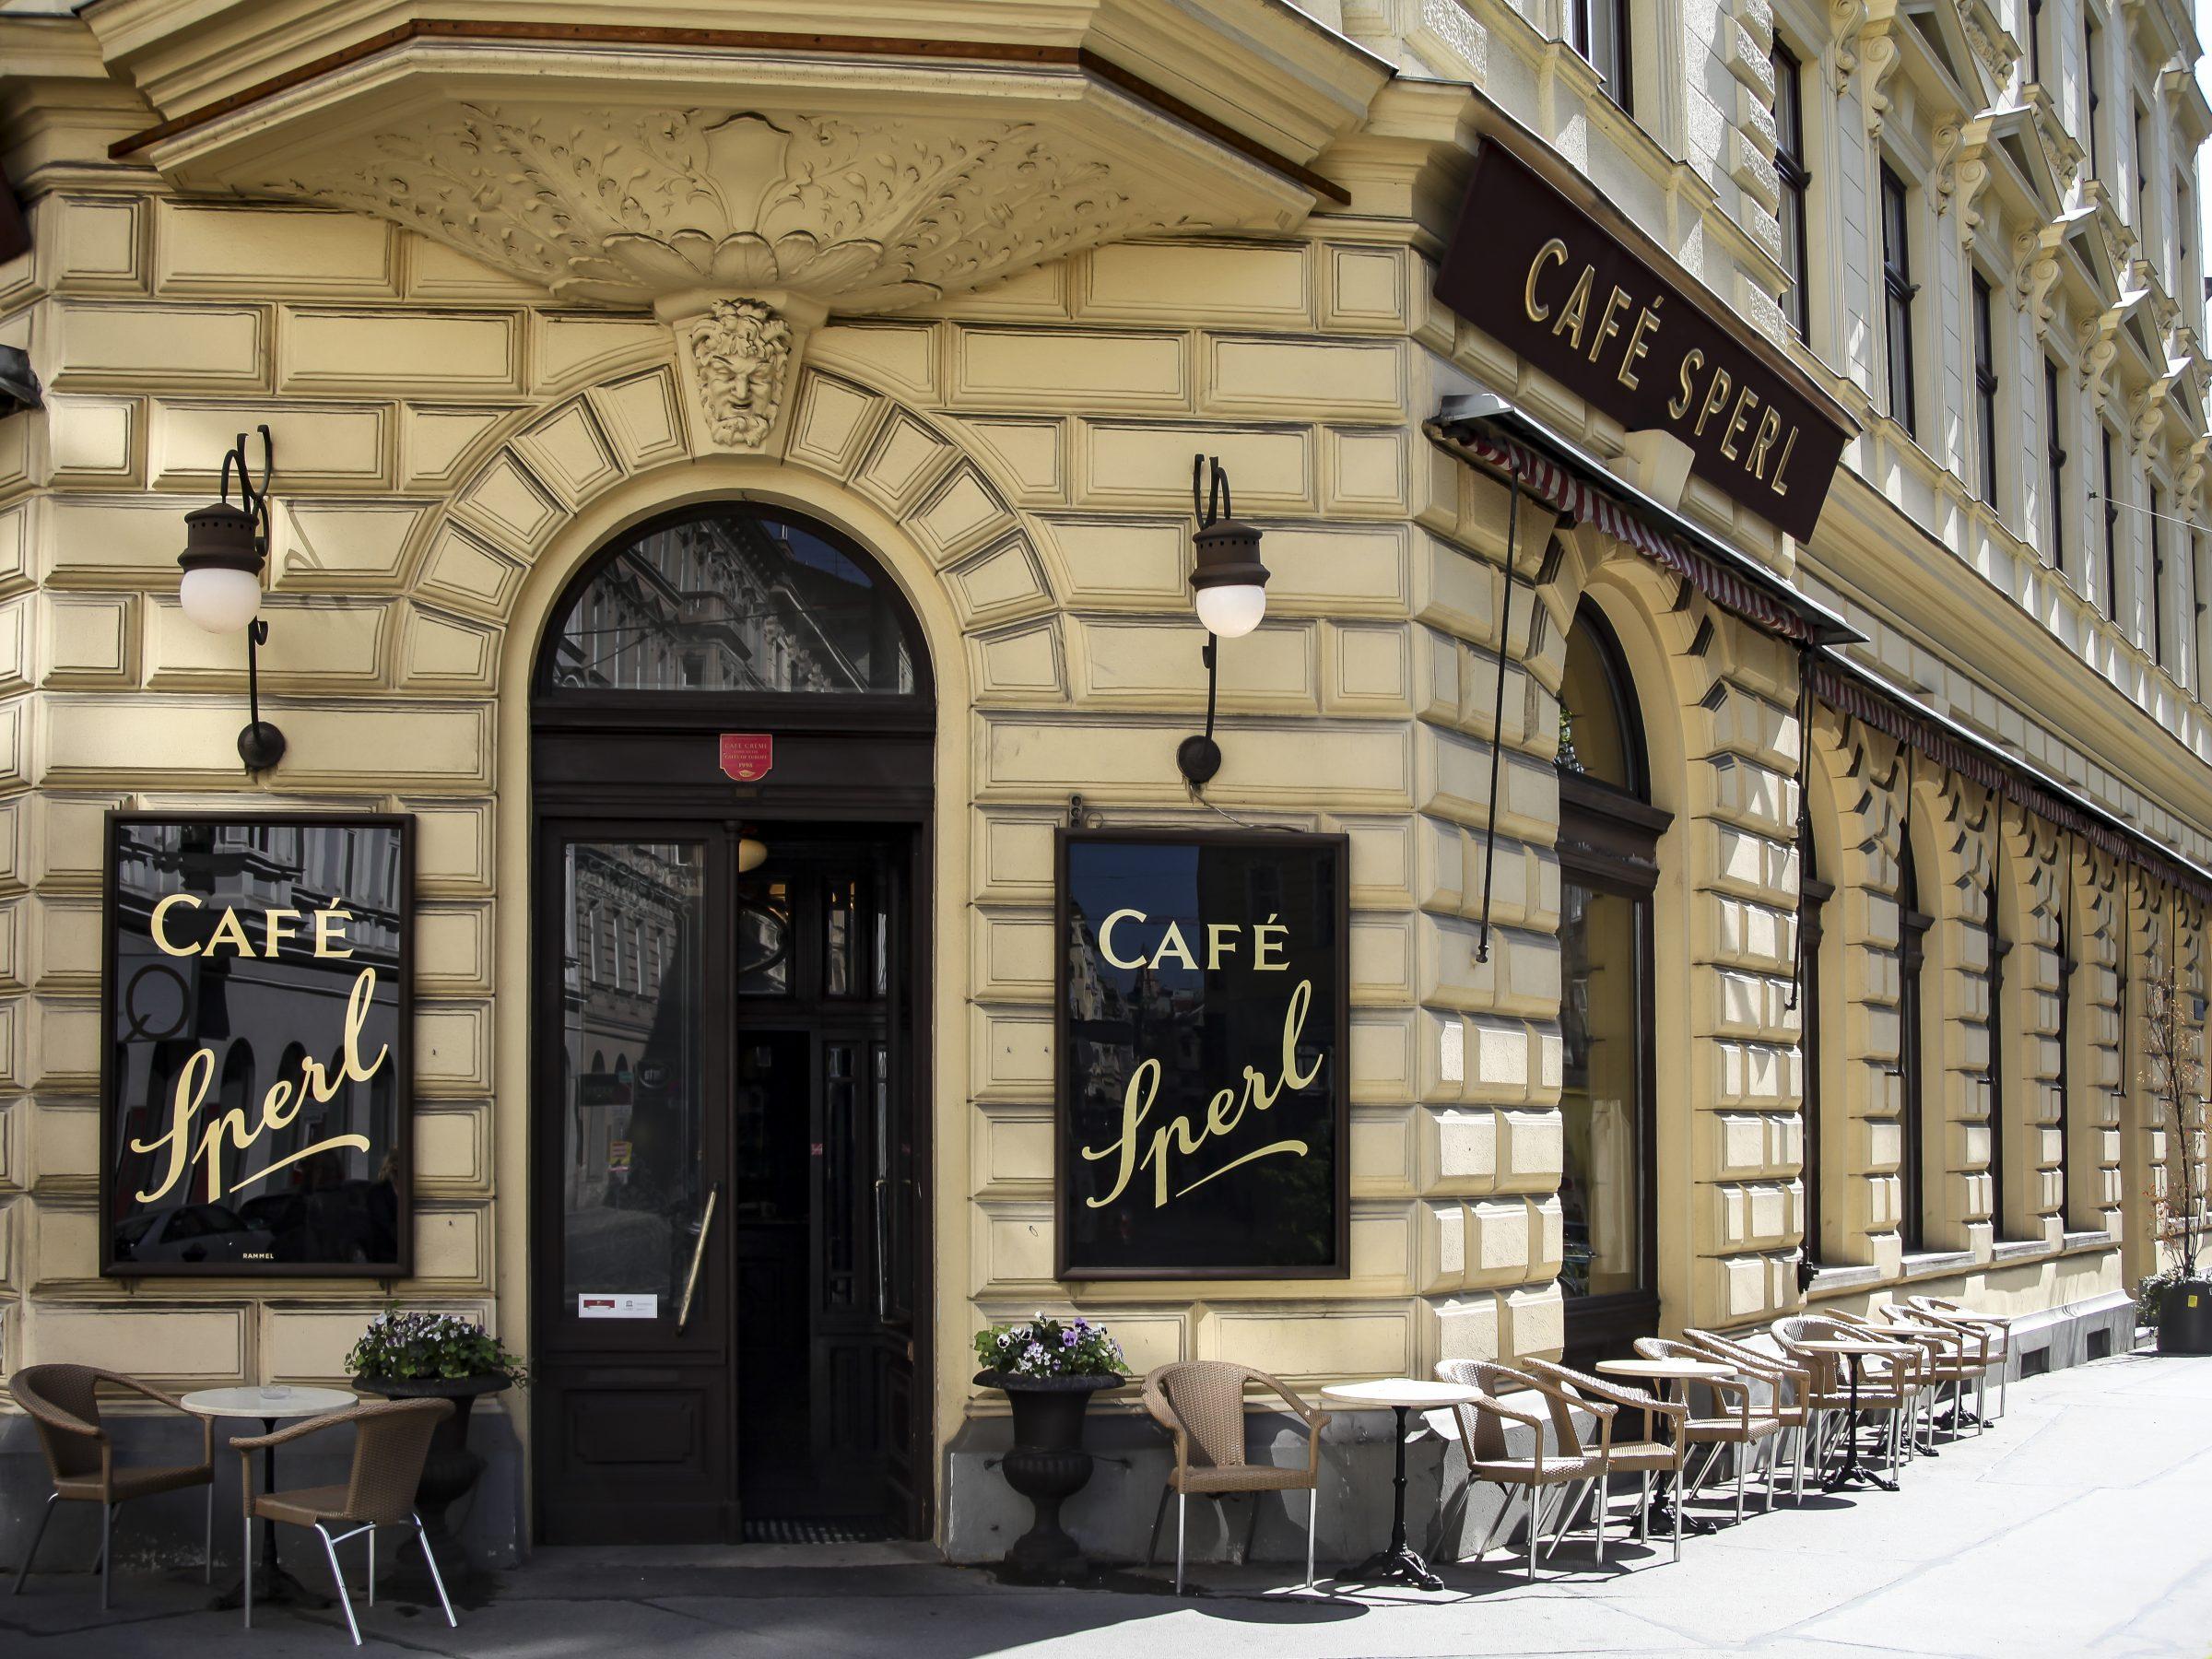 cafe sperl wien 12 | Café Sperl in Vienna